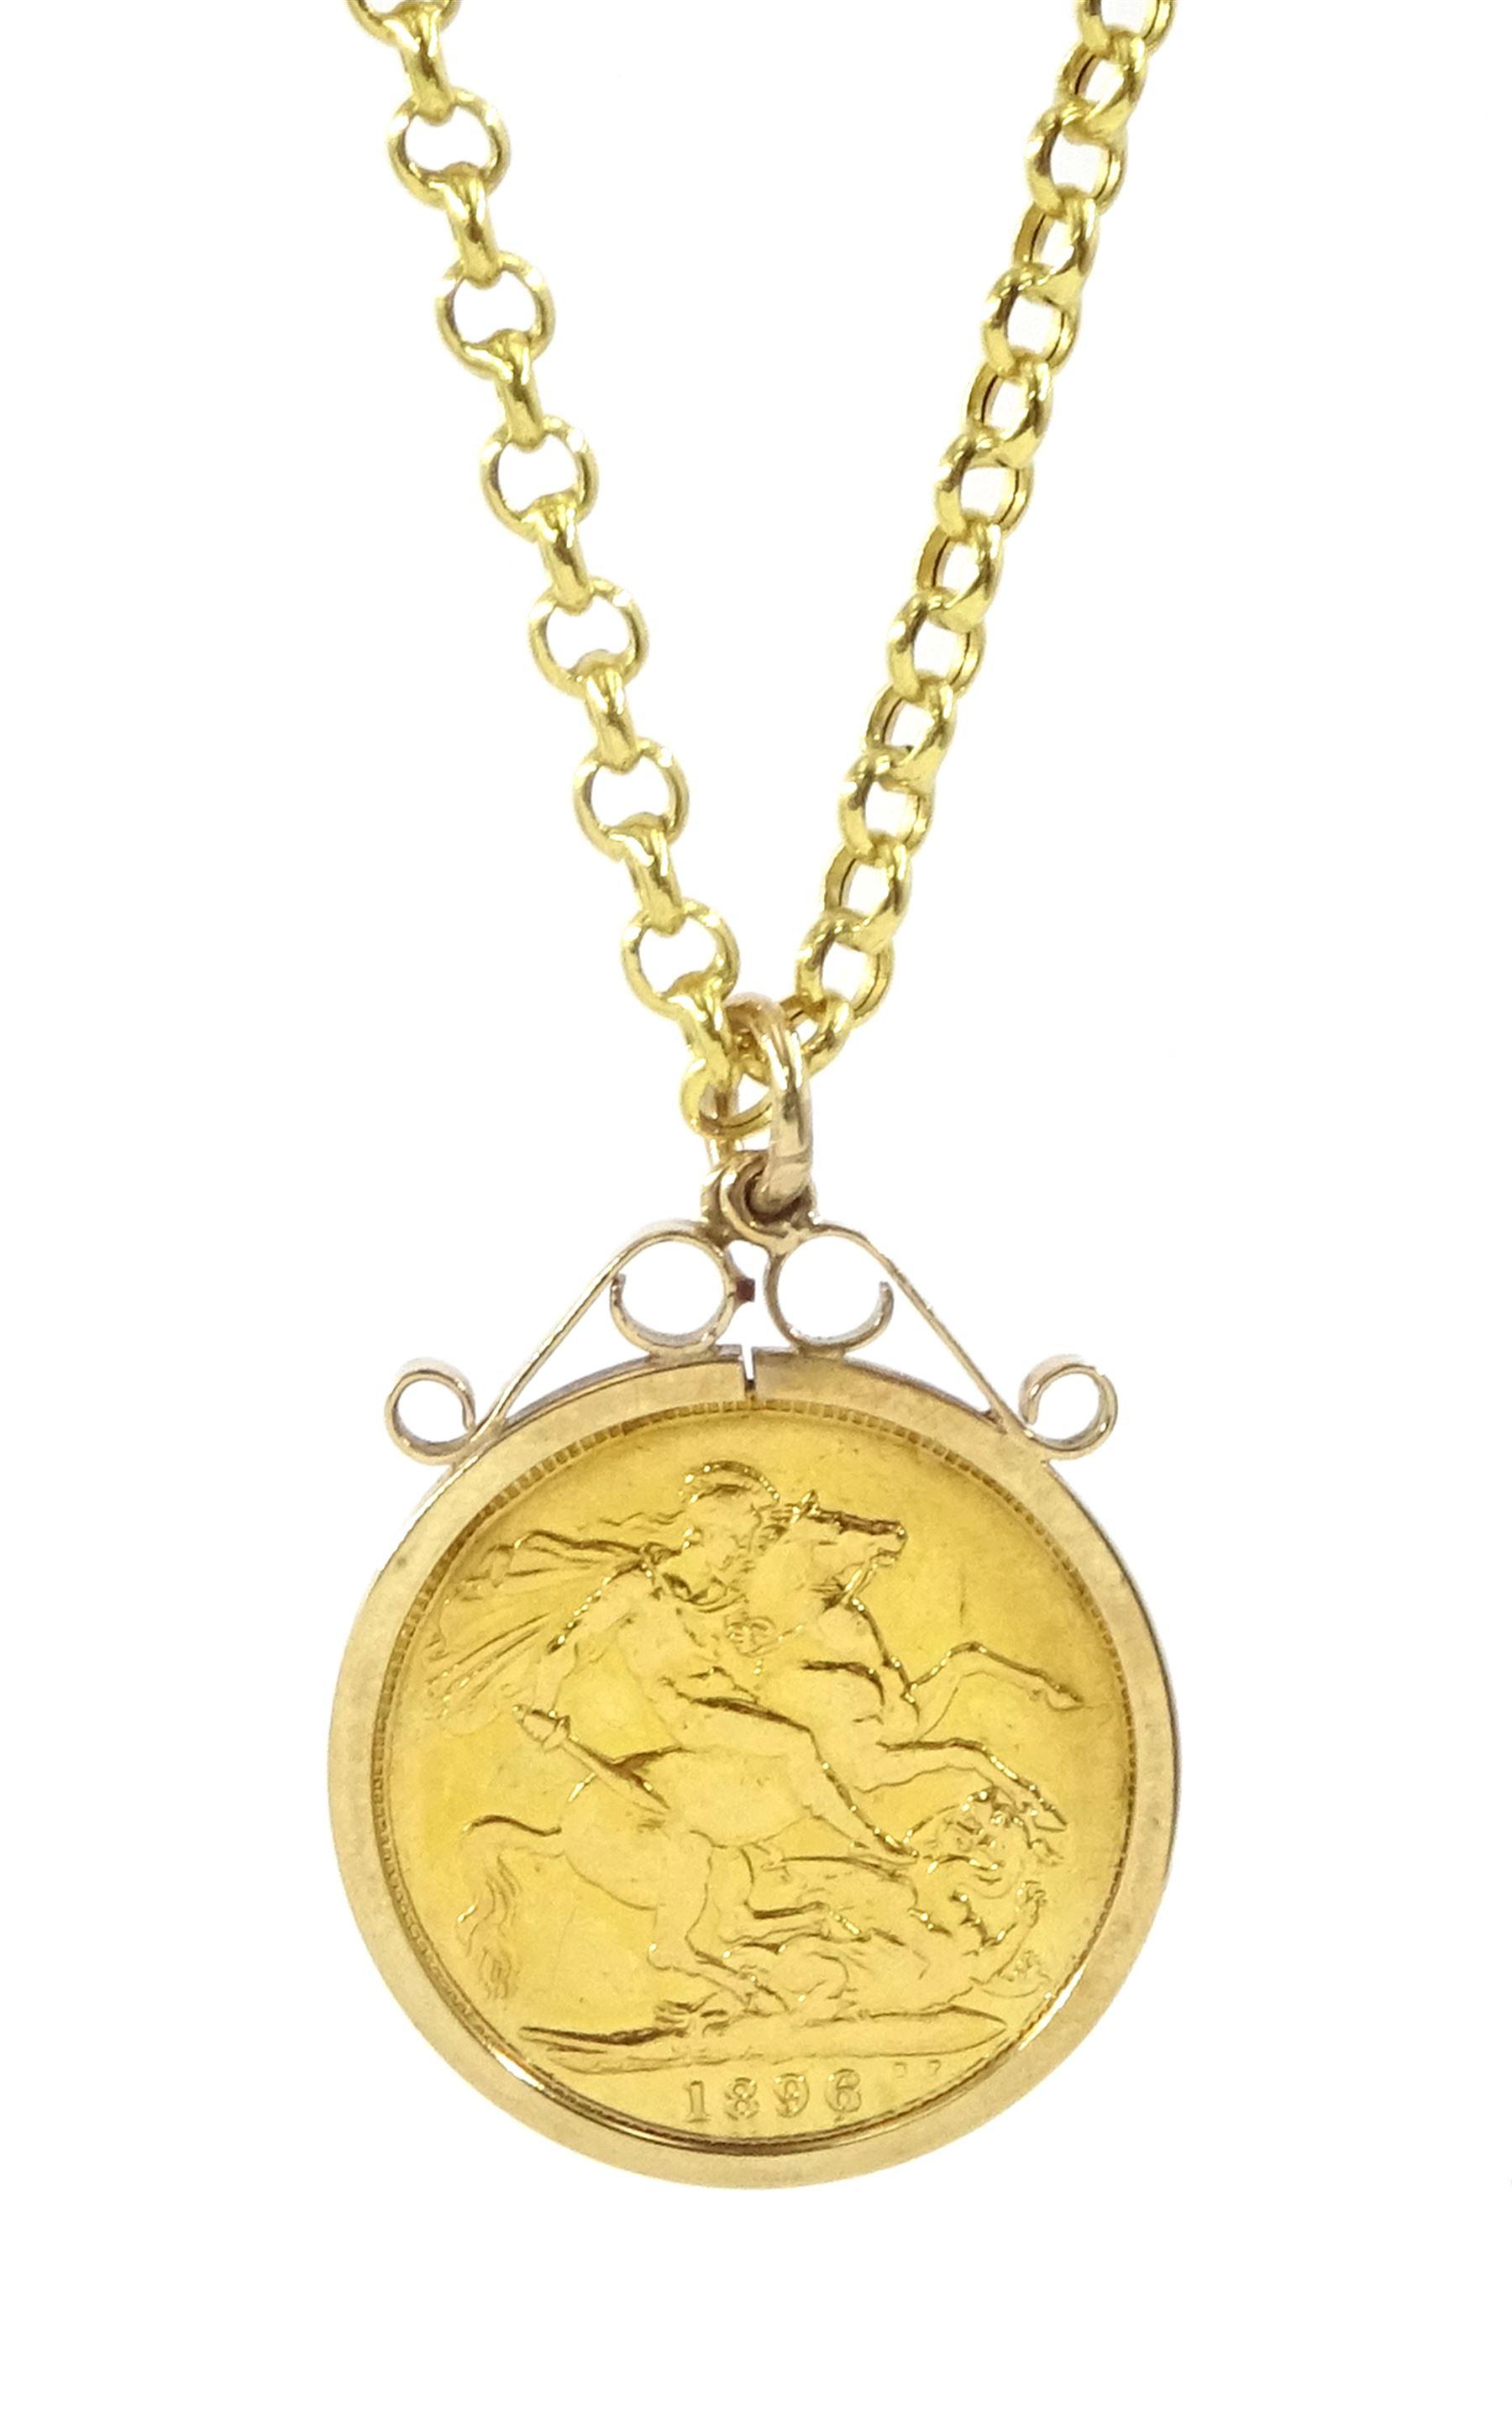 Queen Victoria 1896 gold full sovereign coin